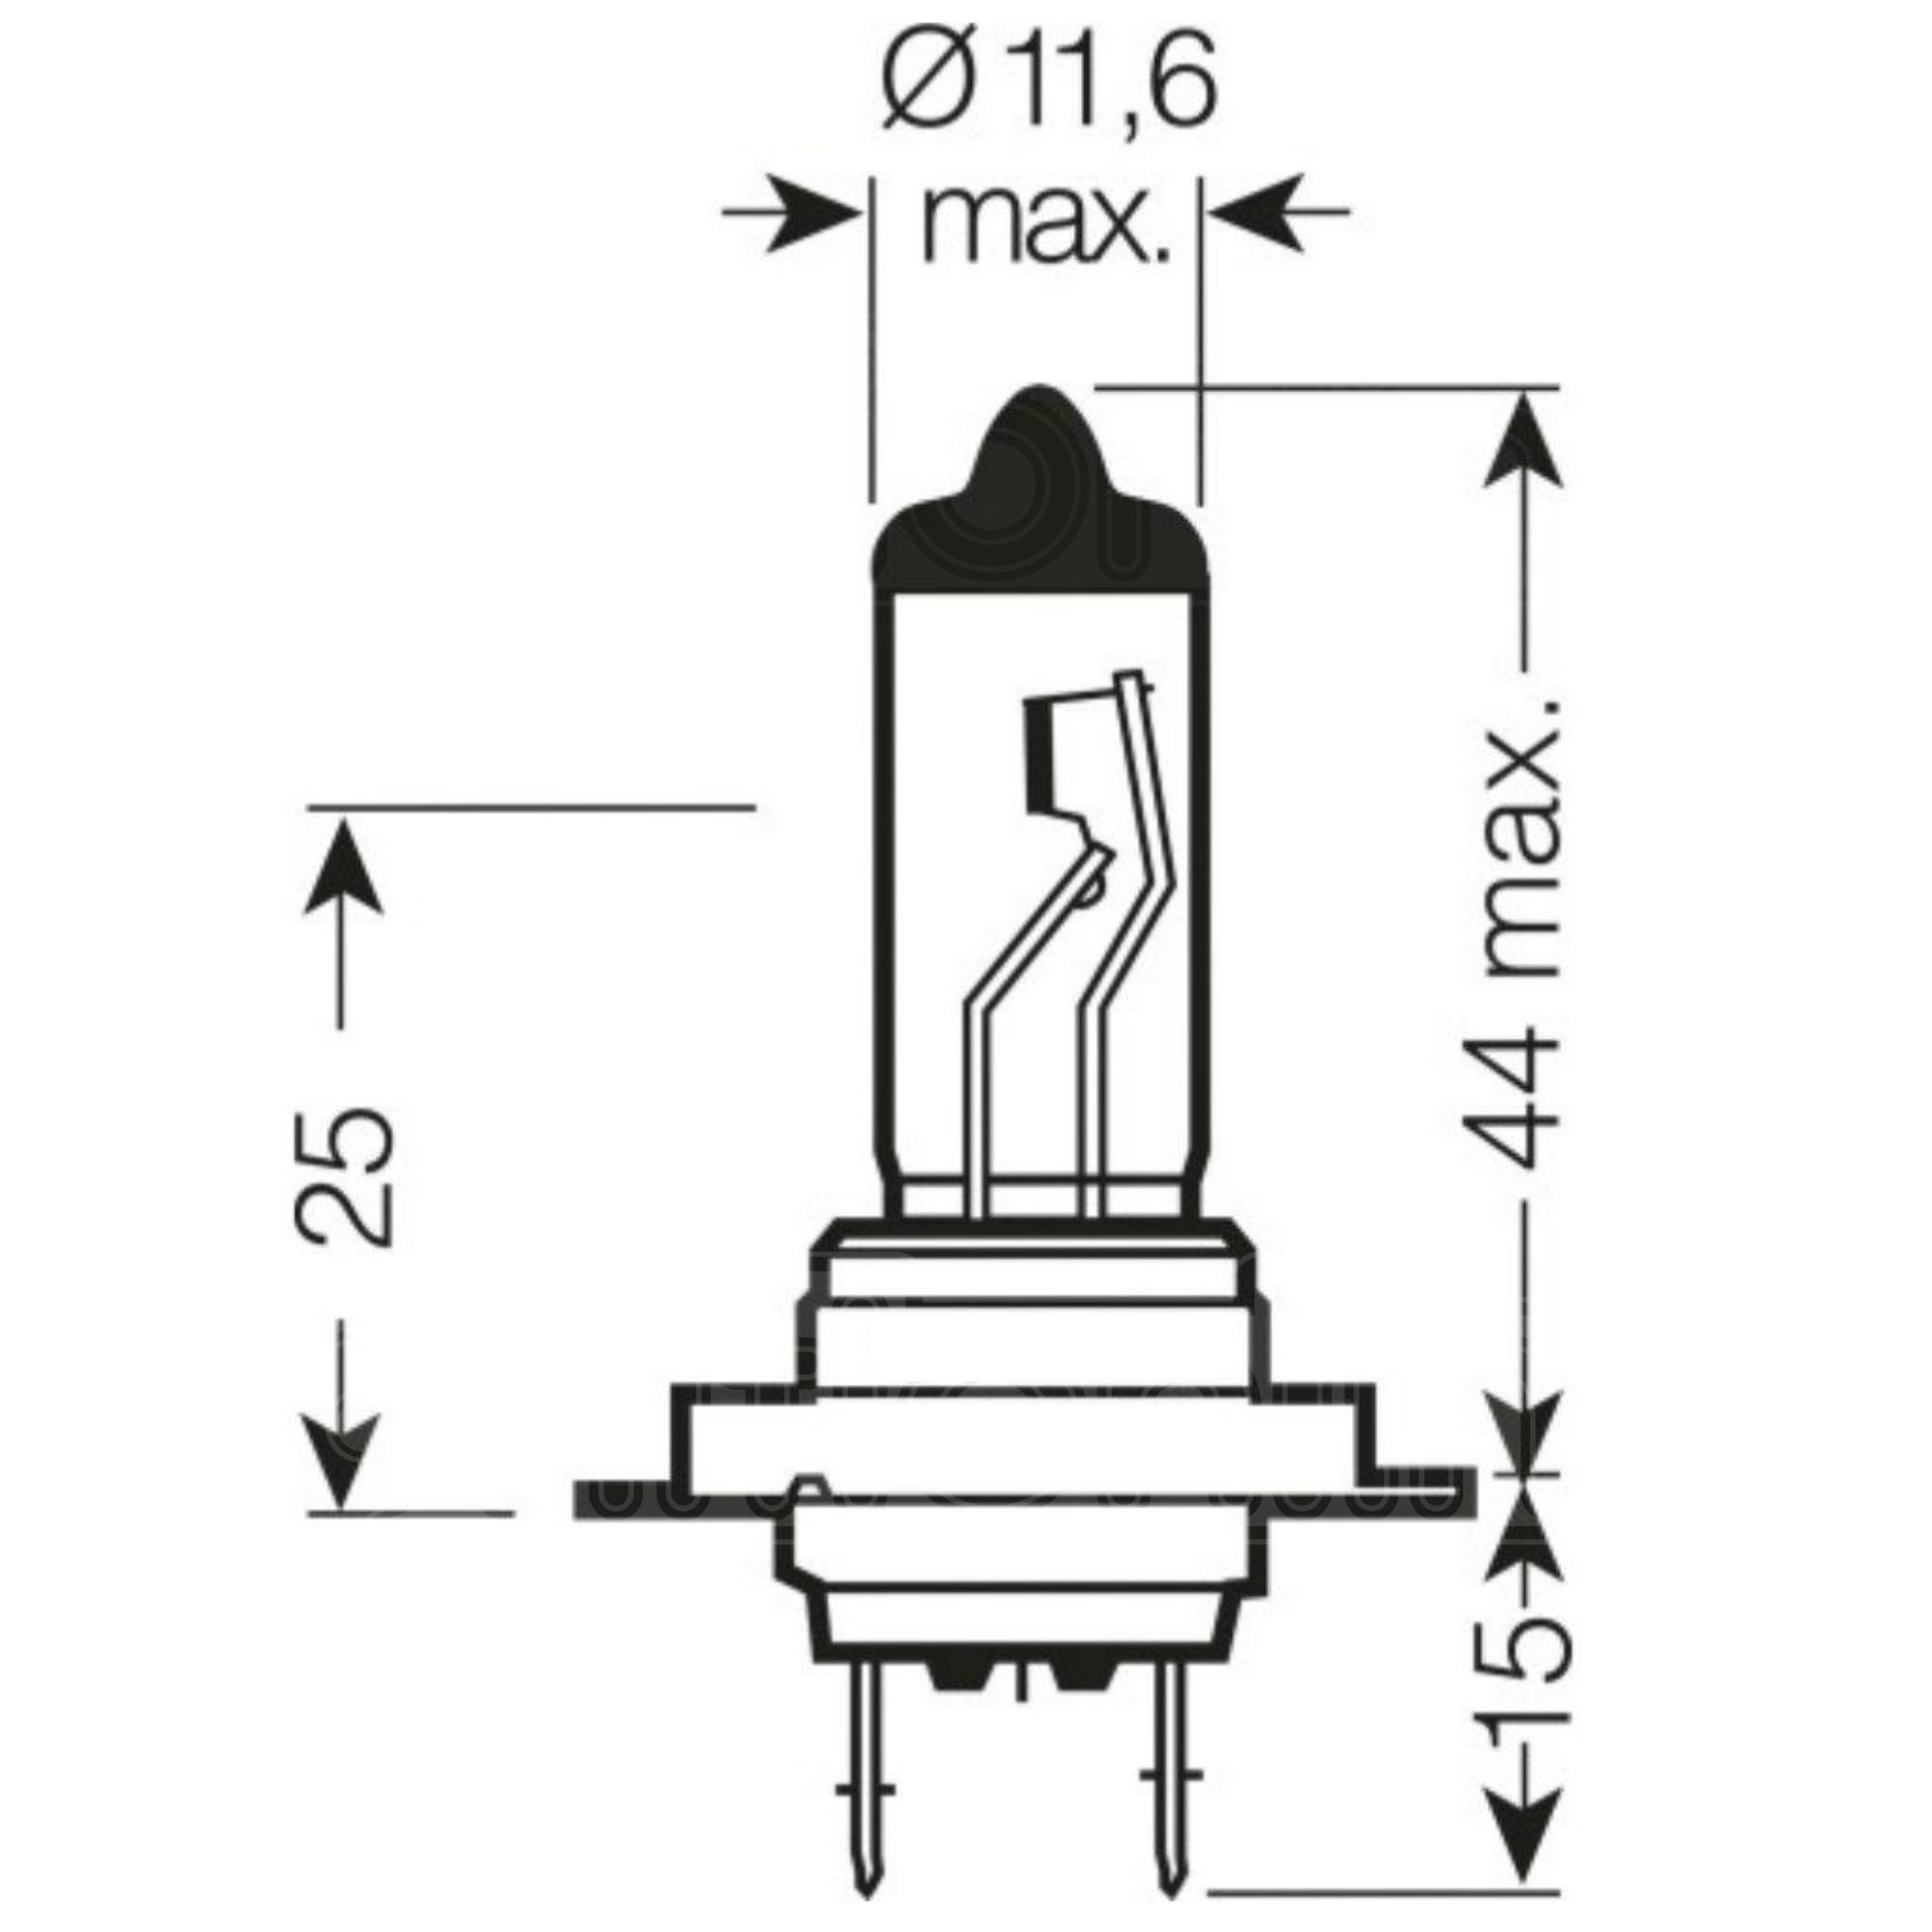 2 X H7 499 477 12v 55w Halogen Car Headlight Headlamp